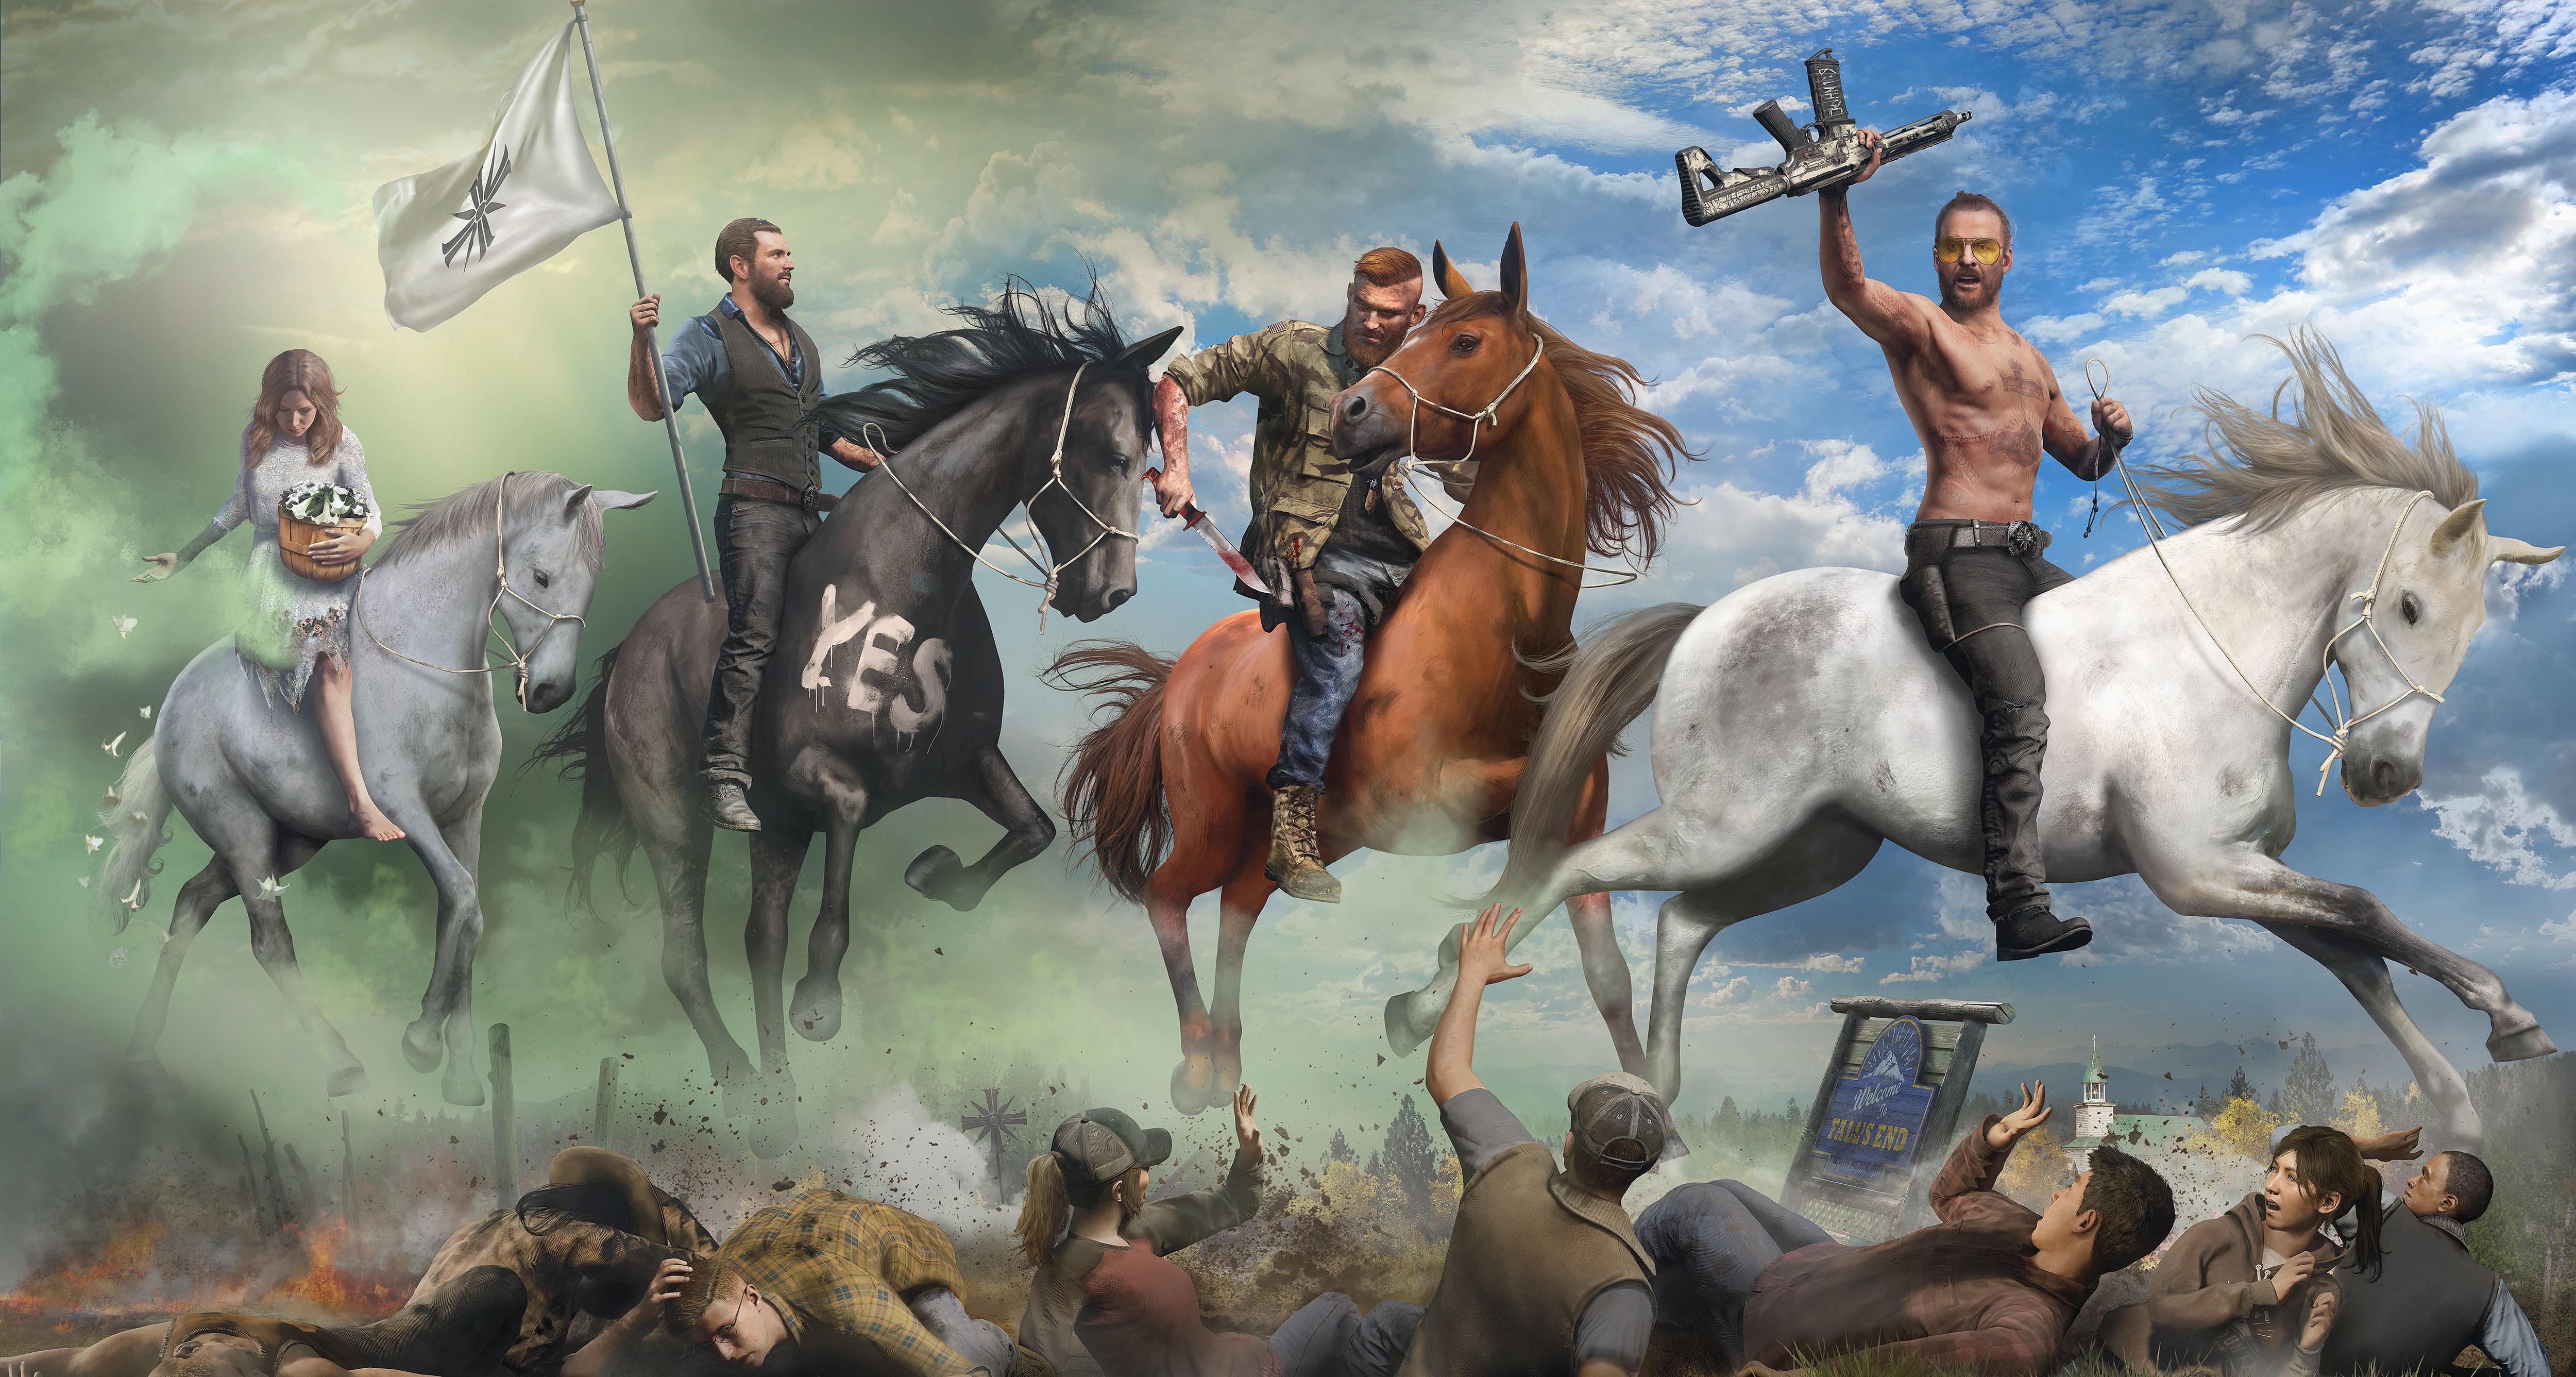 Far Cry 5 Horse Poster Hd Wallpaper 5000x2672 Gludy